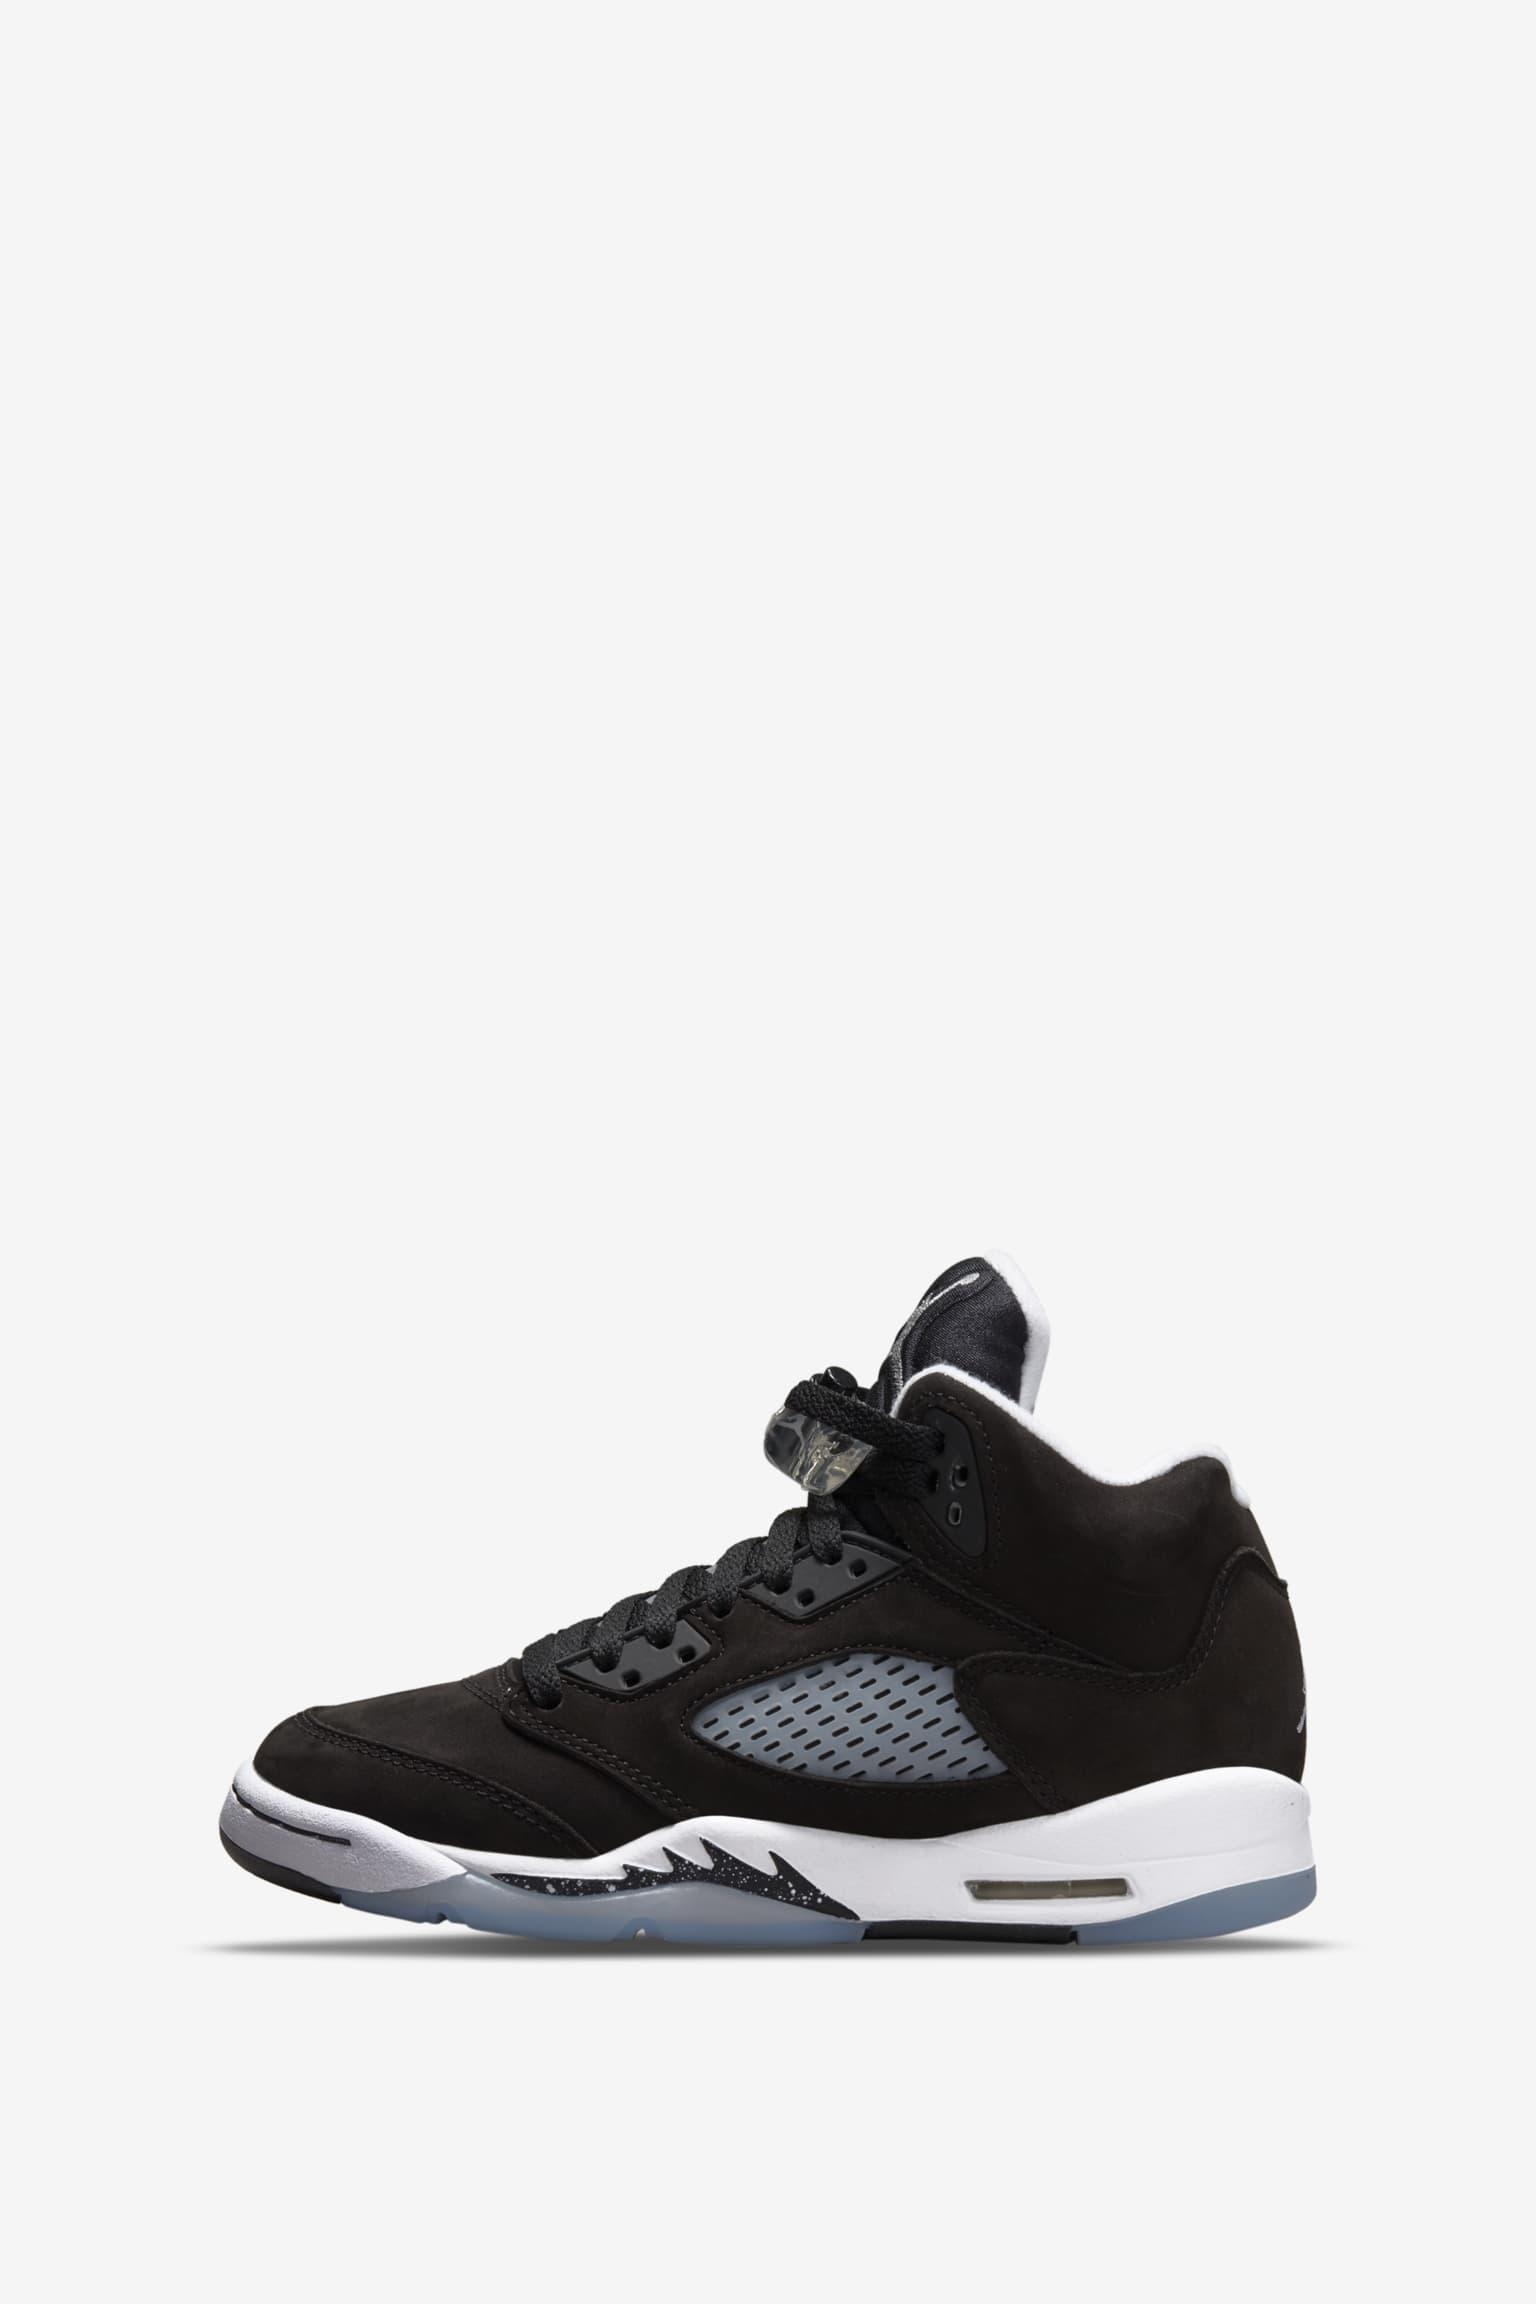 Air Jordan 5 'Moonlight' Release Date. Nike SNKRS IN